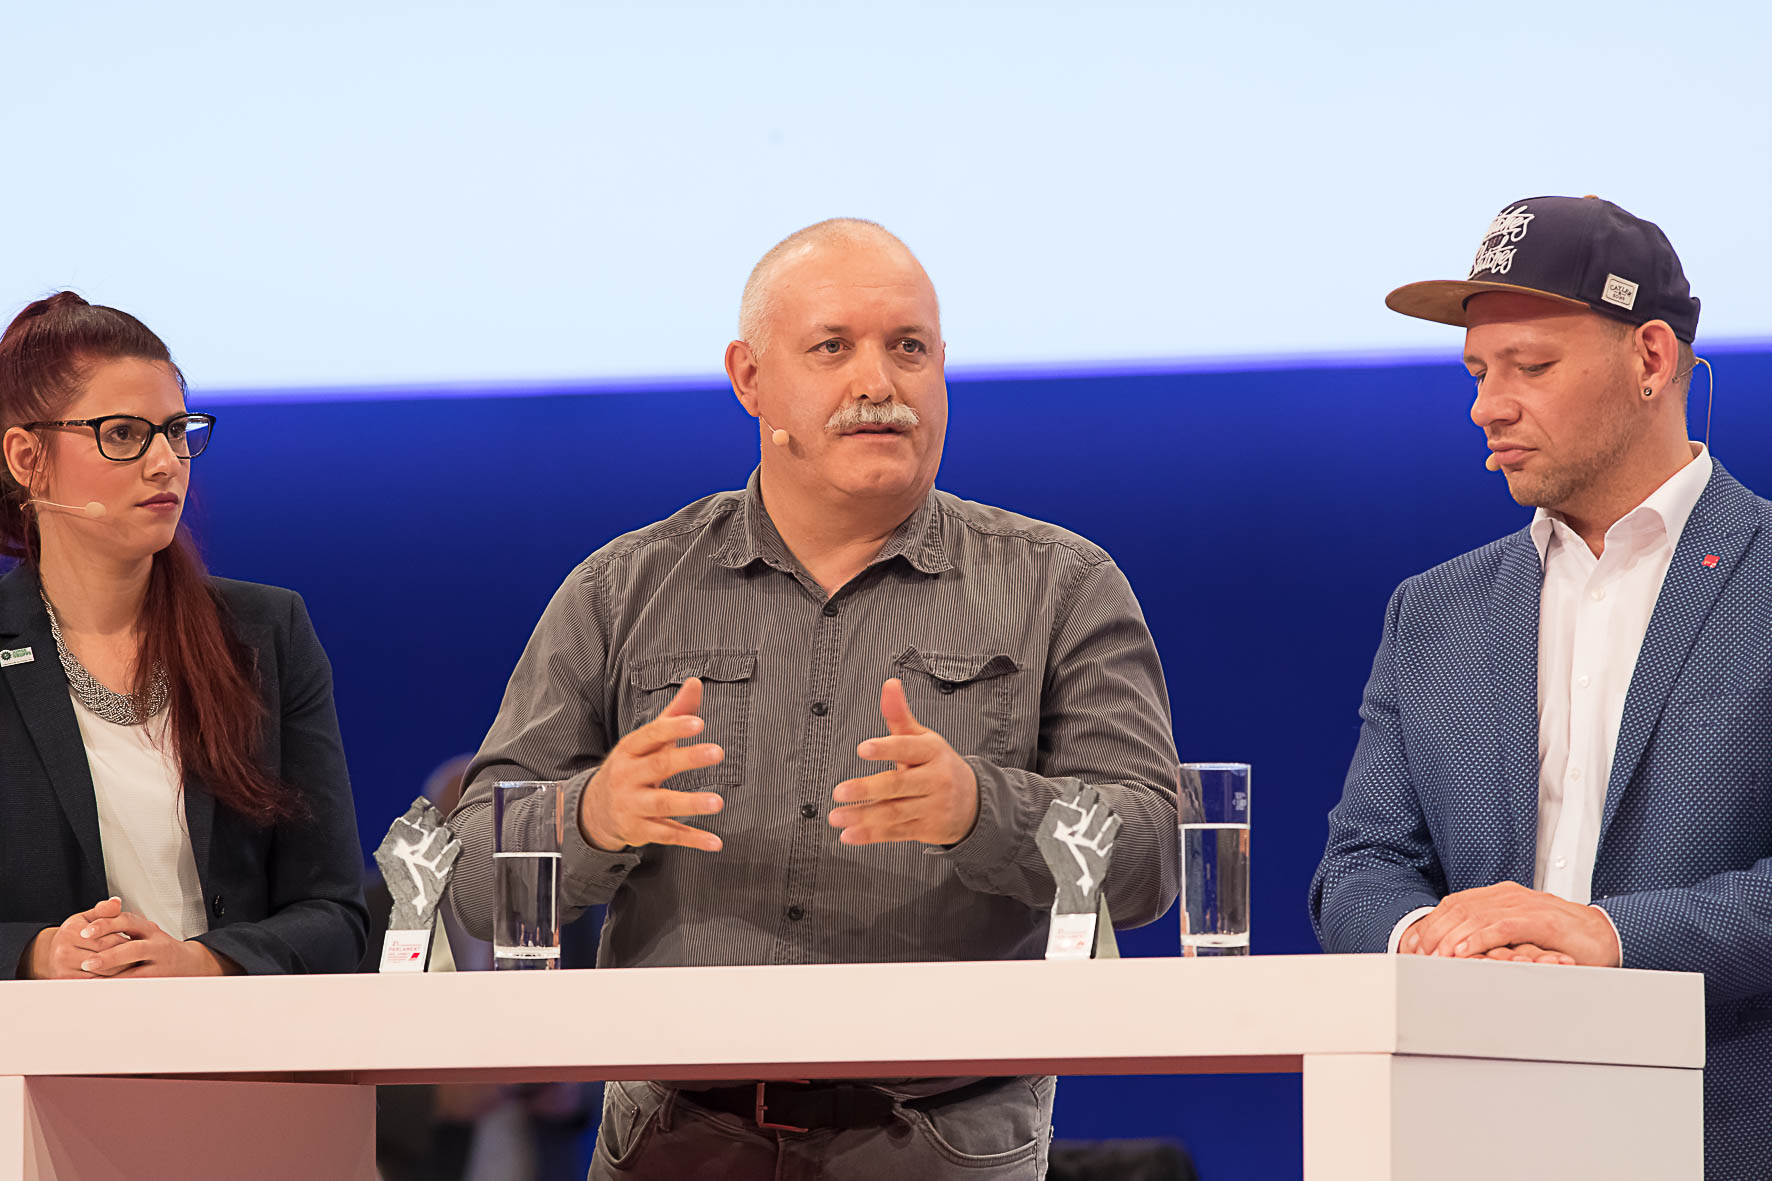 Maike Neumann (Polizistin, GdP), Andreas Liste (Jobcenter Halle, ver.di), Rajko Wengel (Ordnungsamt Kiel, ver.di) im Gespräch